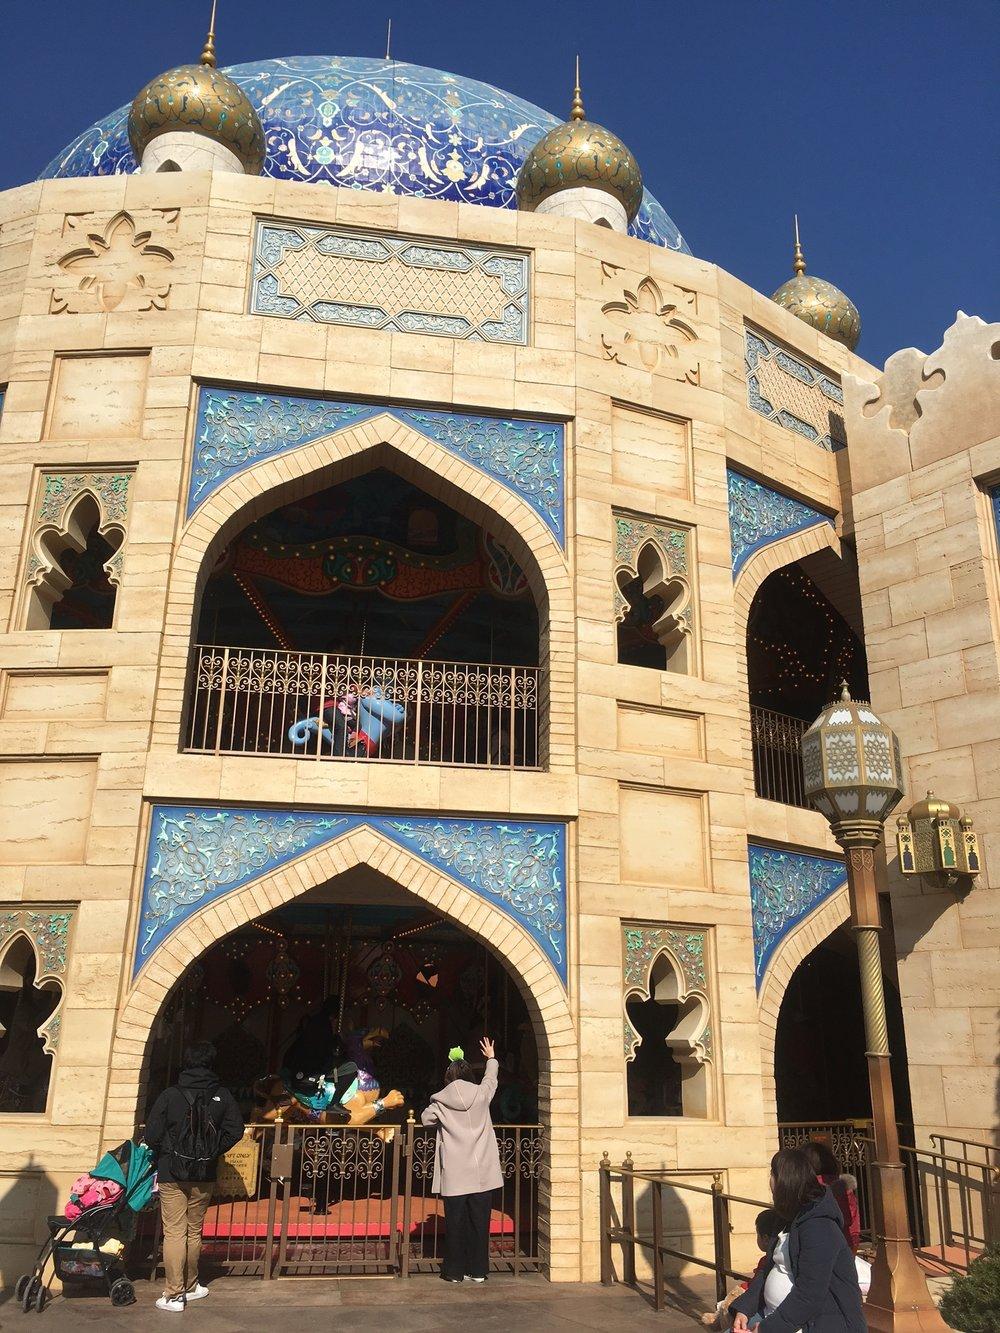 Carousel in the Arabian Port